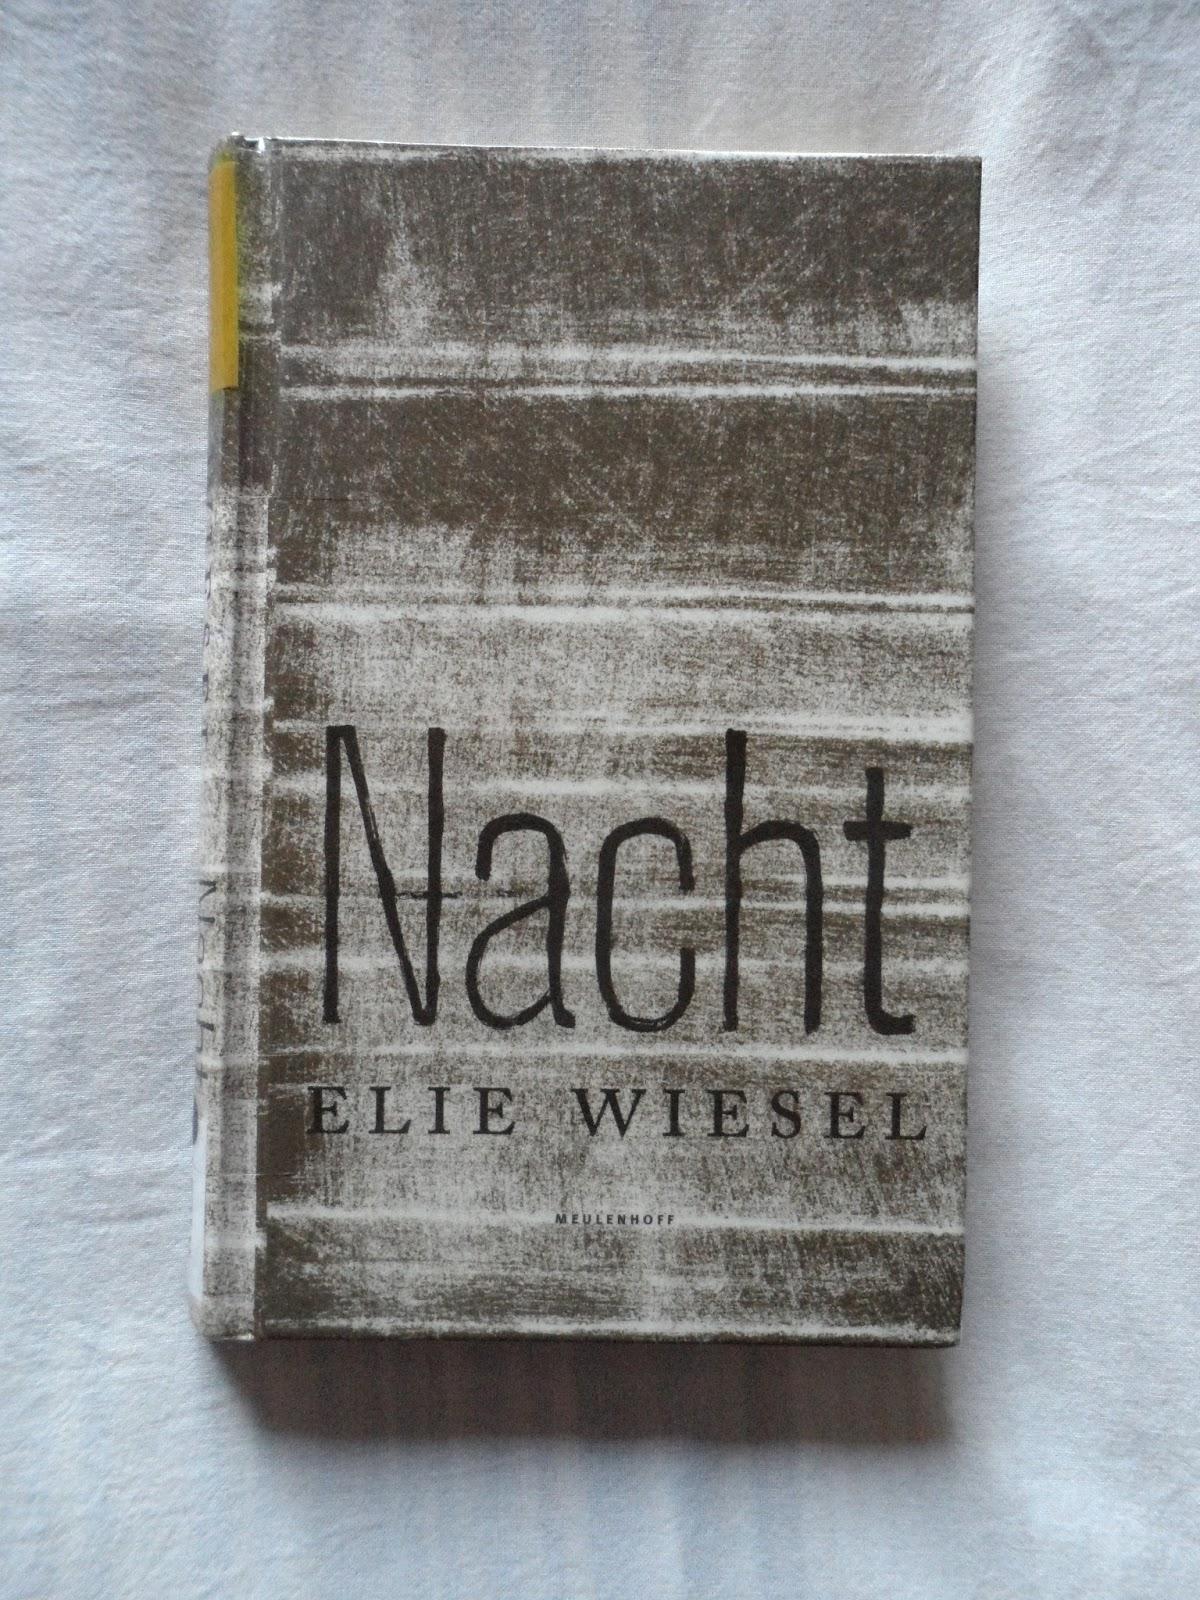 Siskens Place Nacht Elie Wiesel